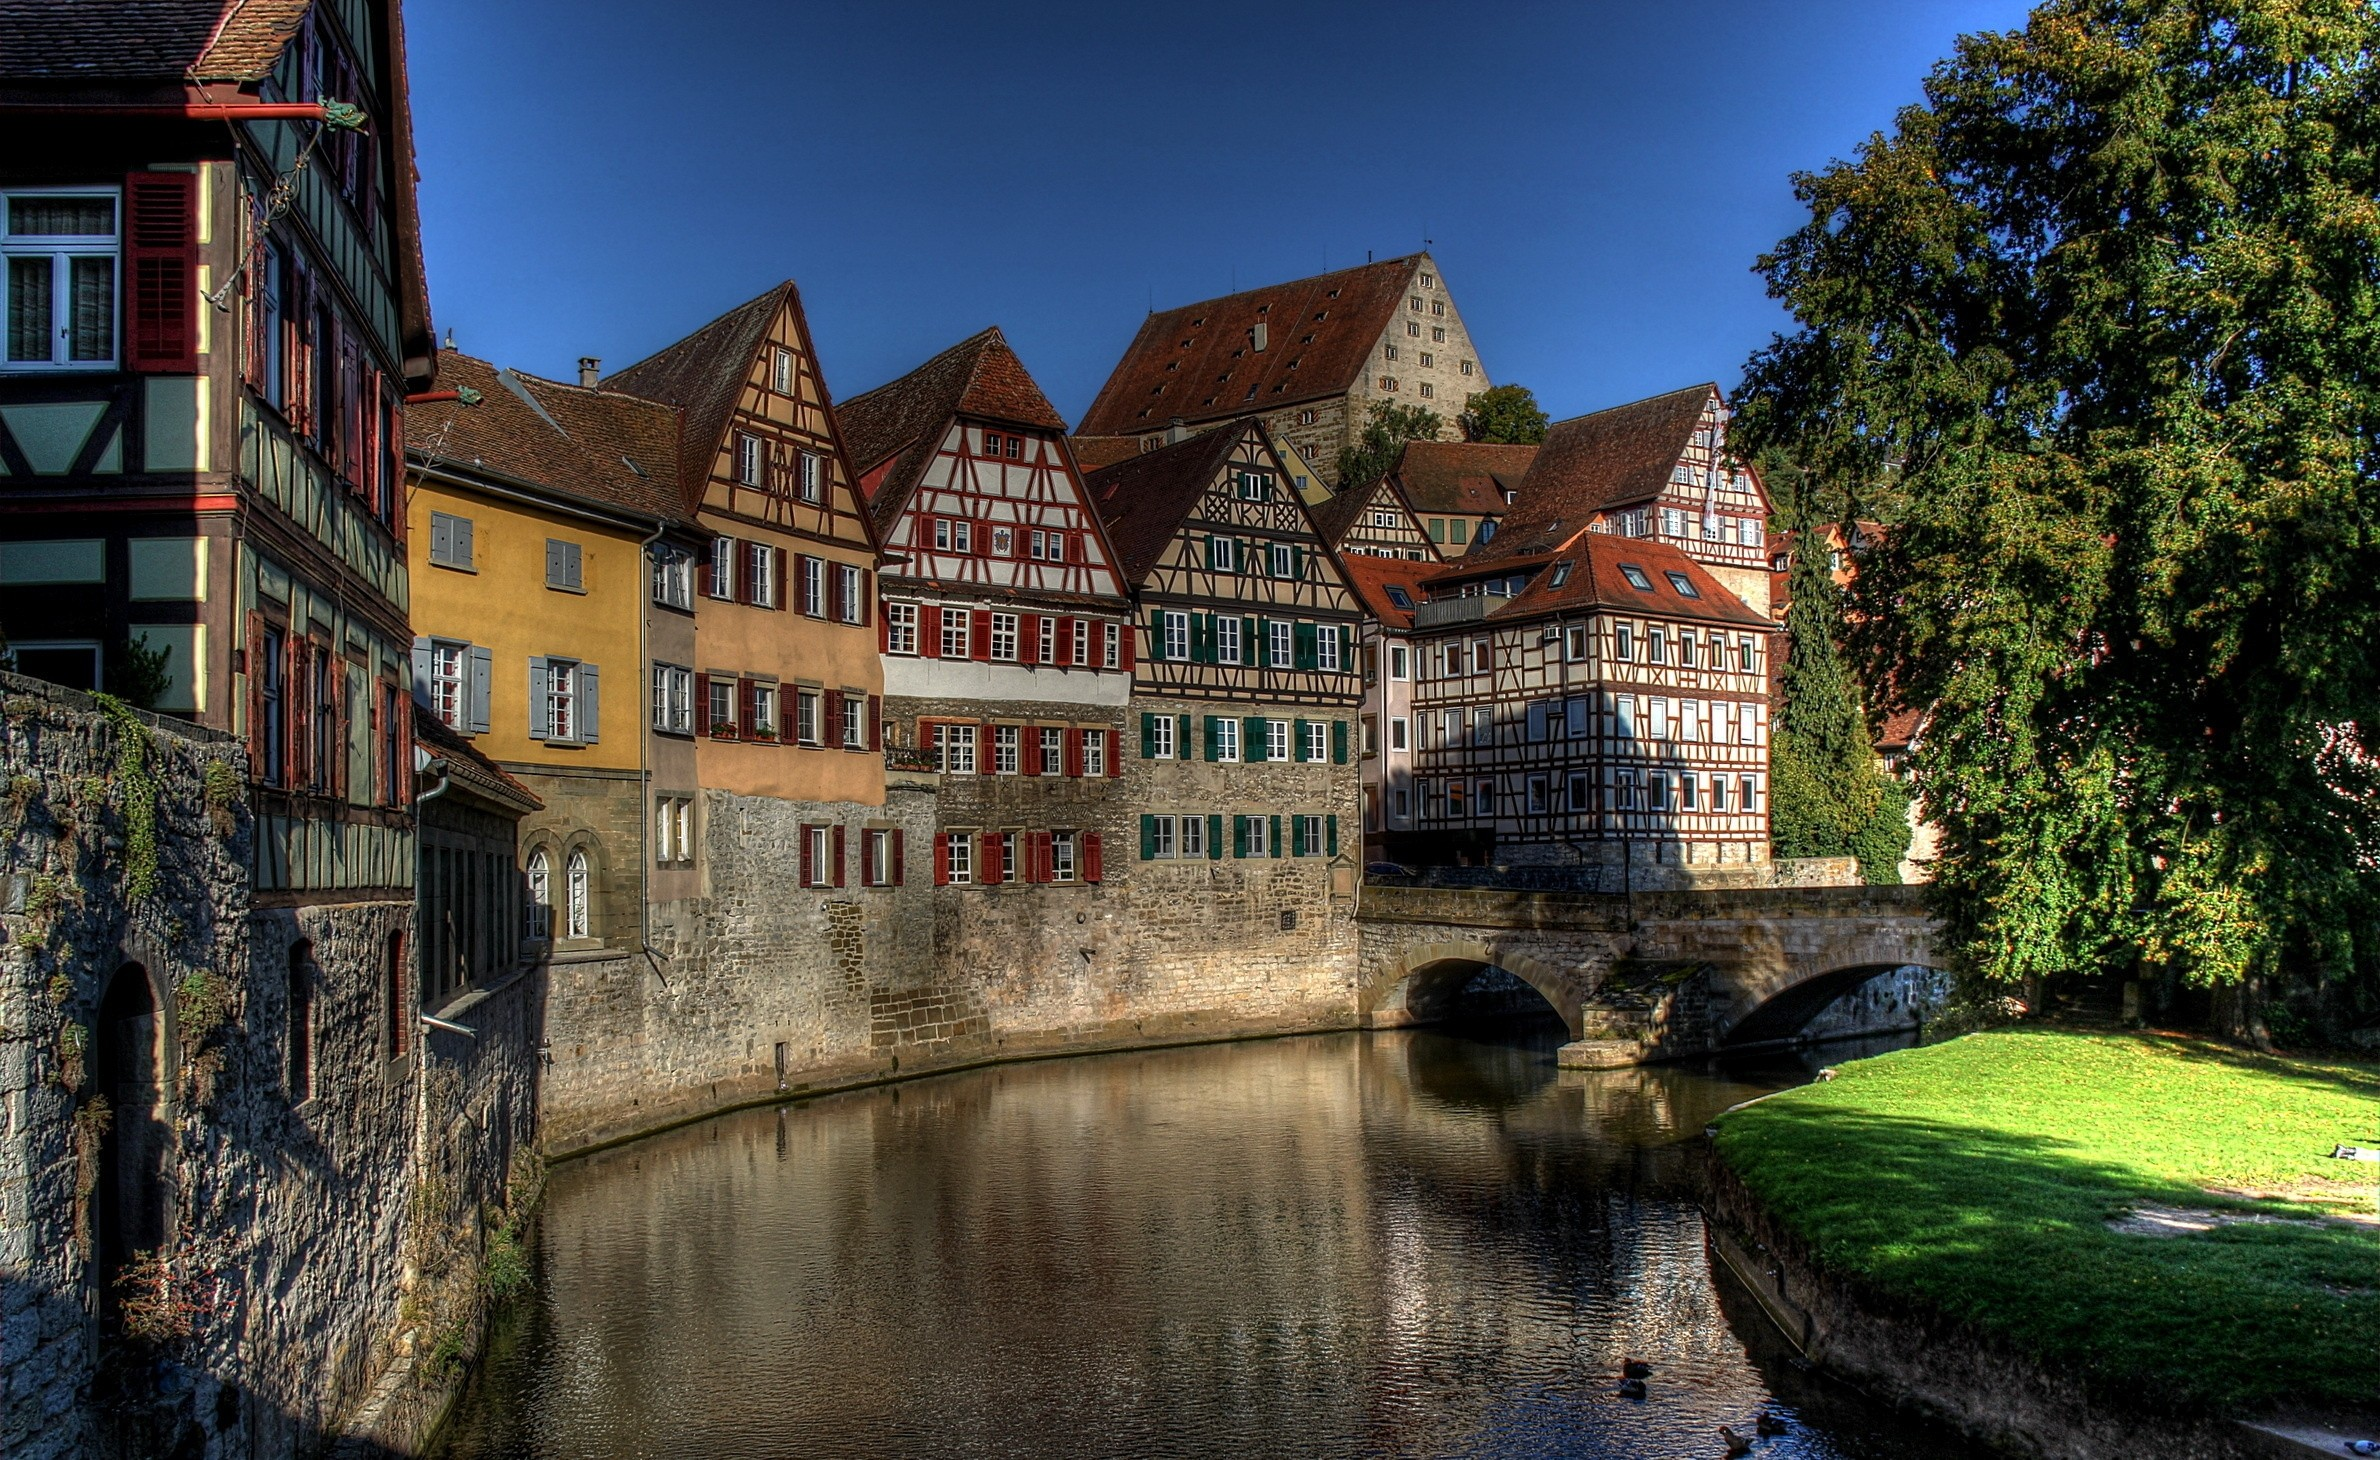 Lorch Village, Hesse, Rhine River, Germany  № 78217 загрузить